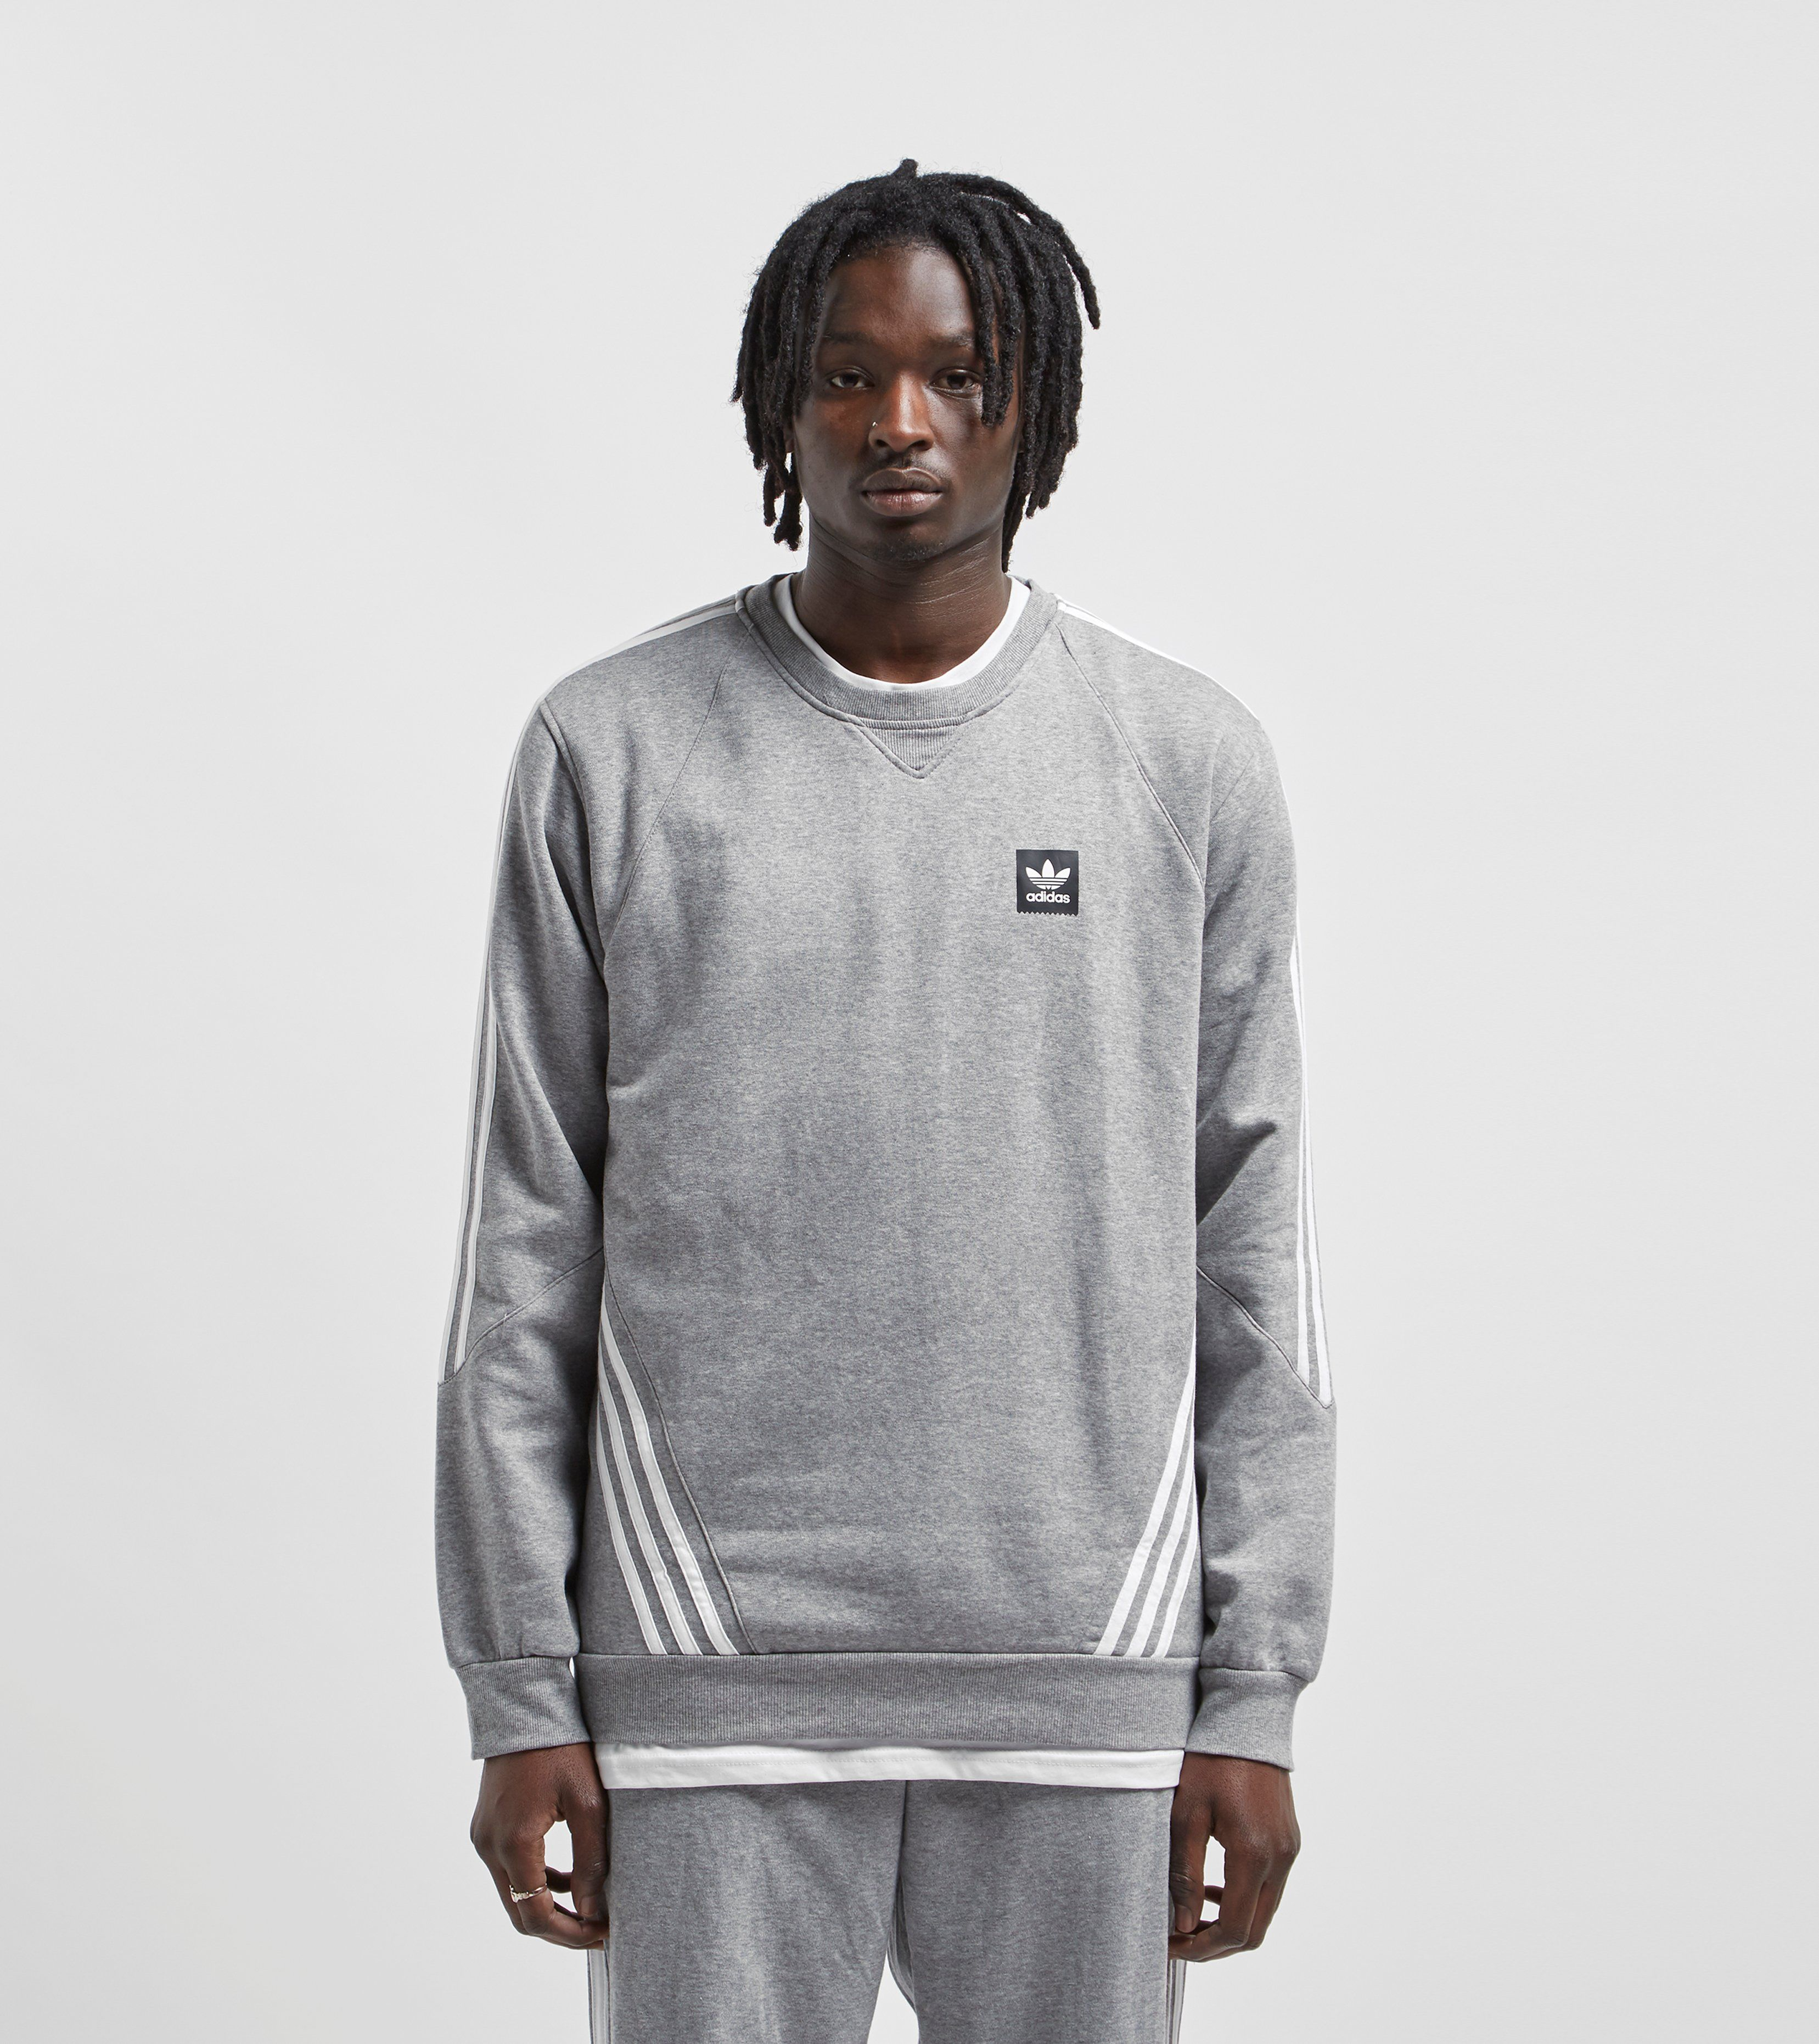 adidas Originals Insley Crewneck Sweatshirt